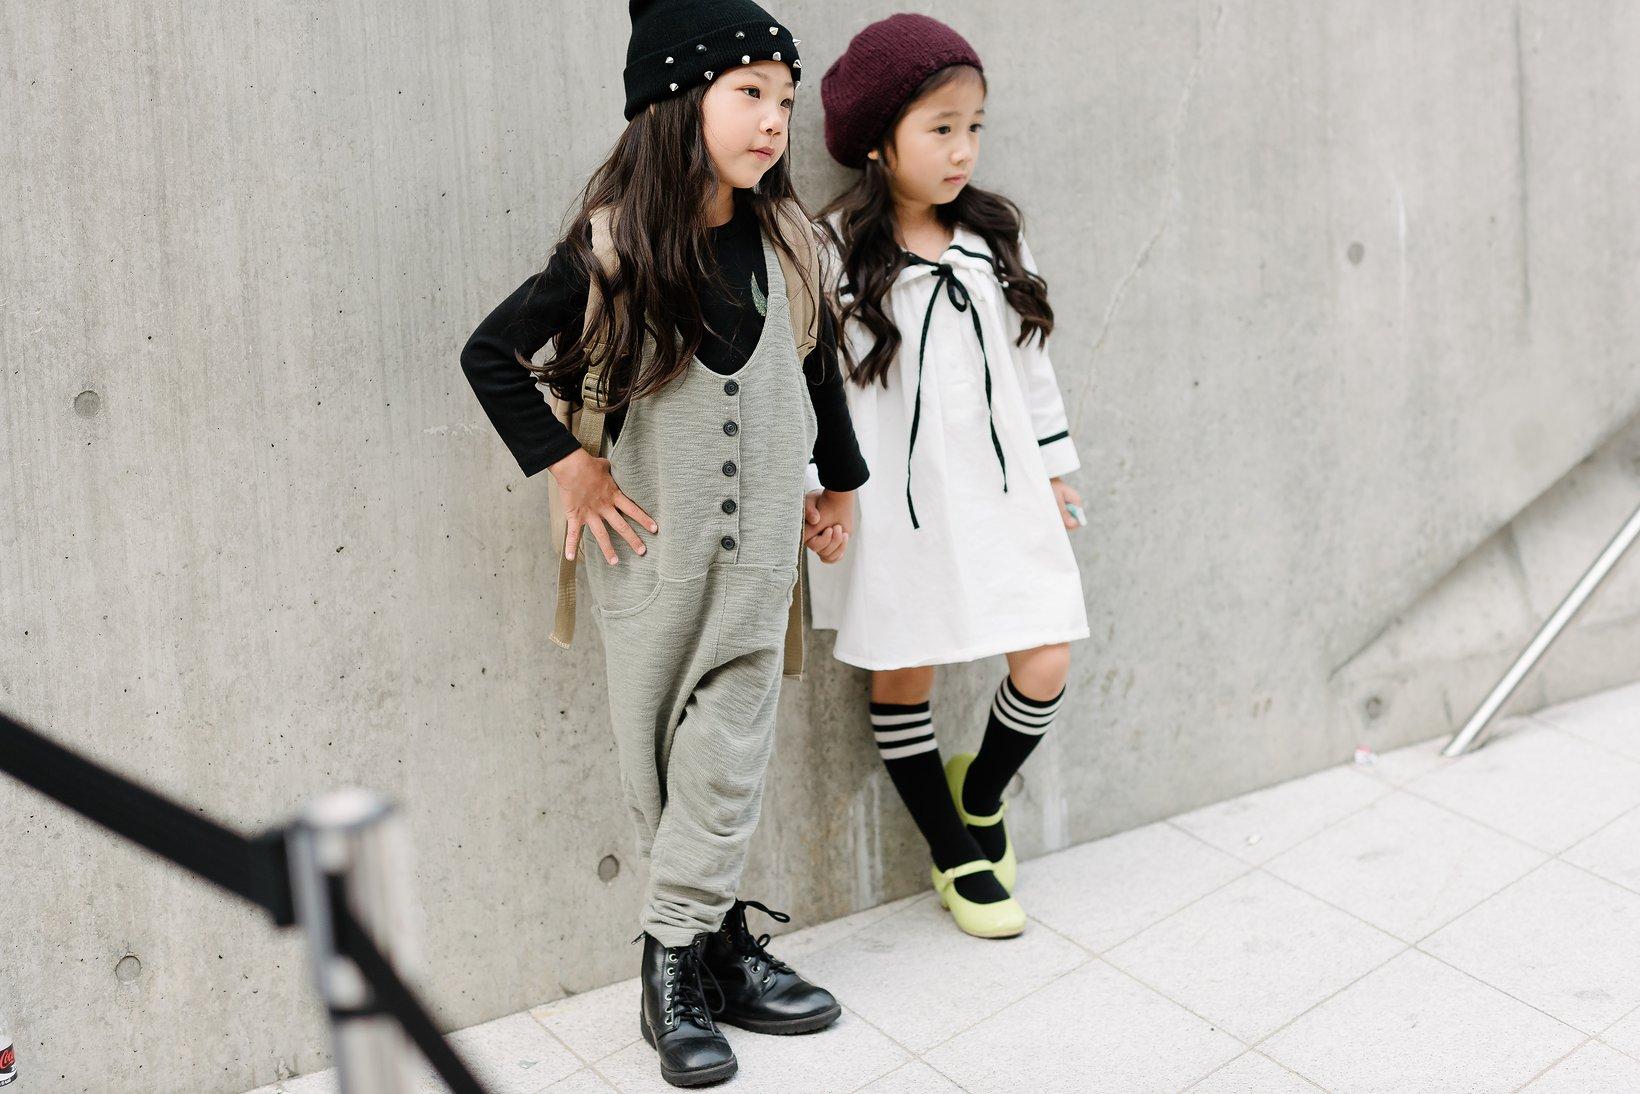 seoul-fashion-week-babies-street-style-11